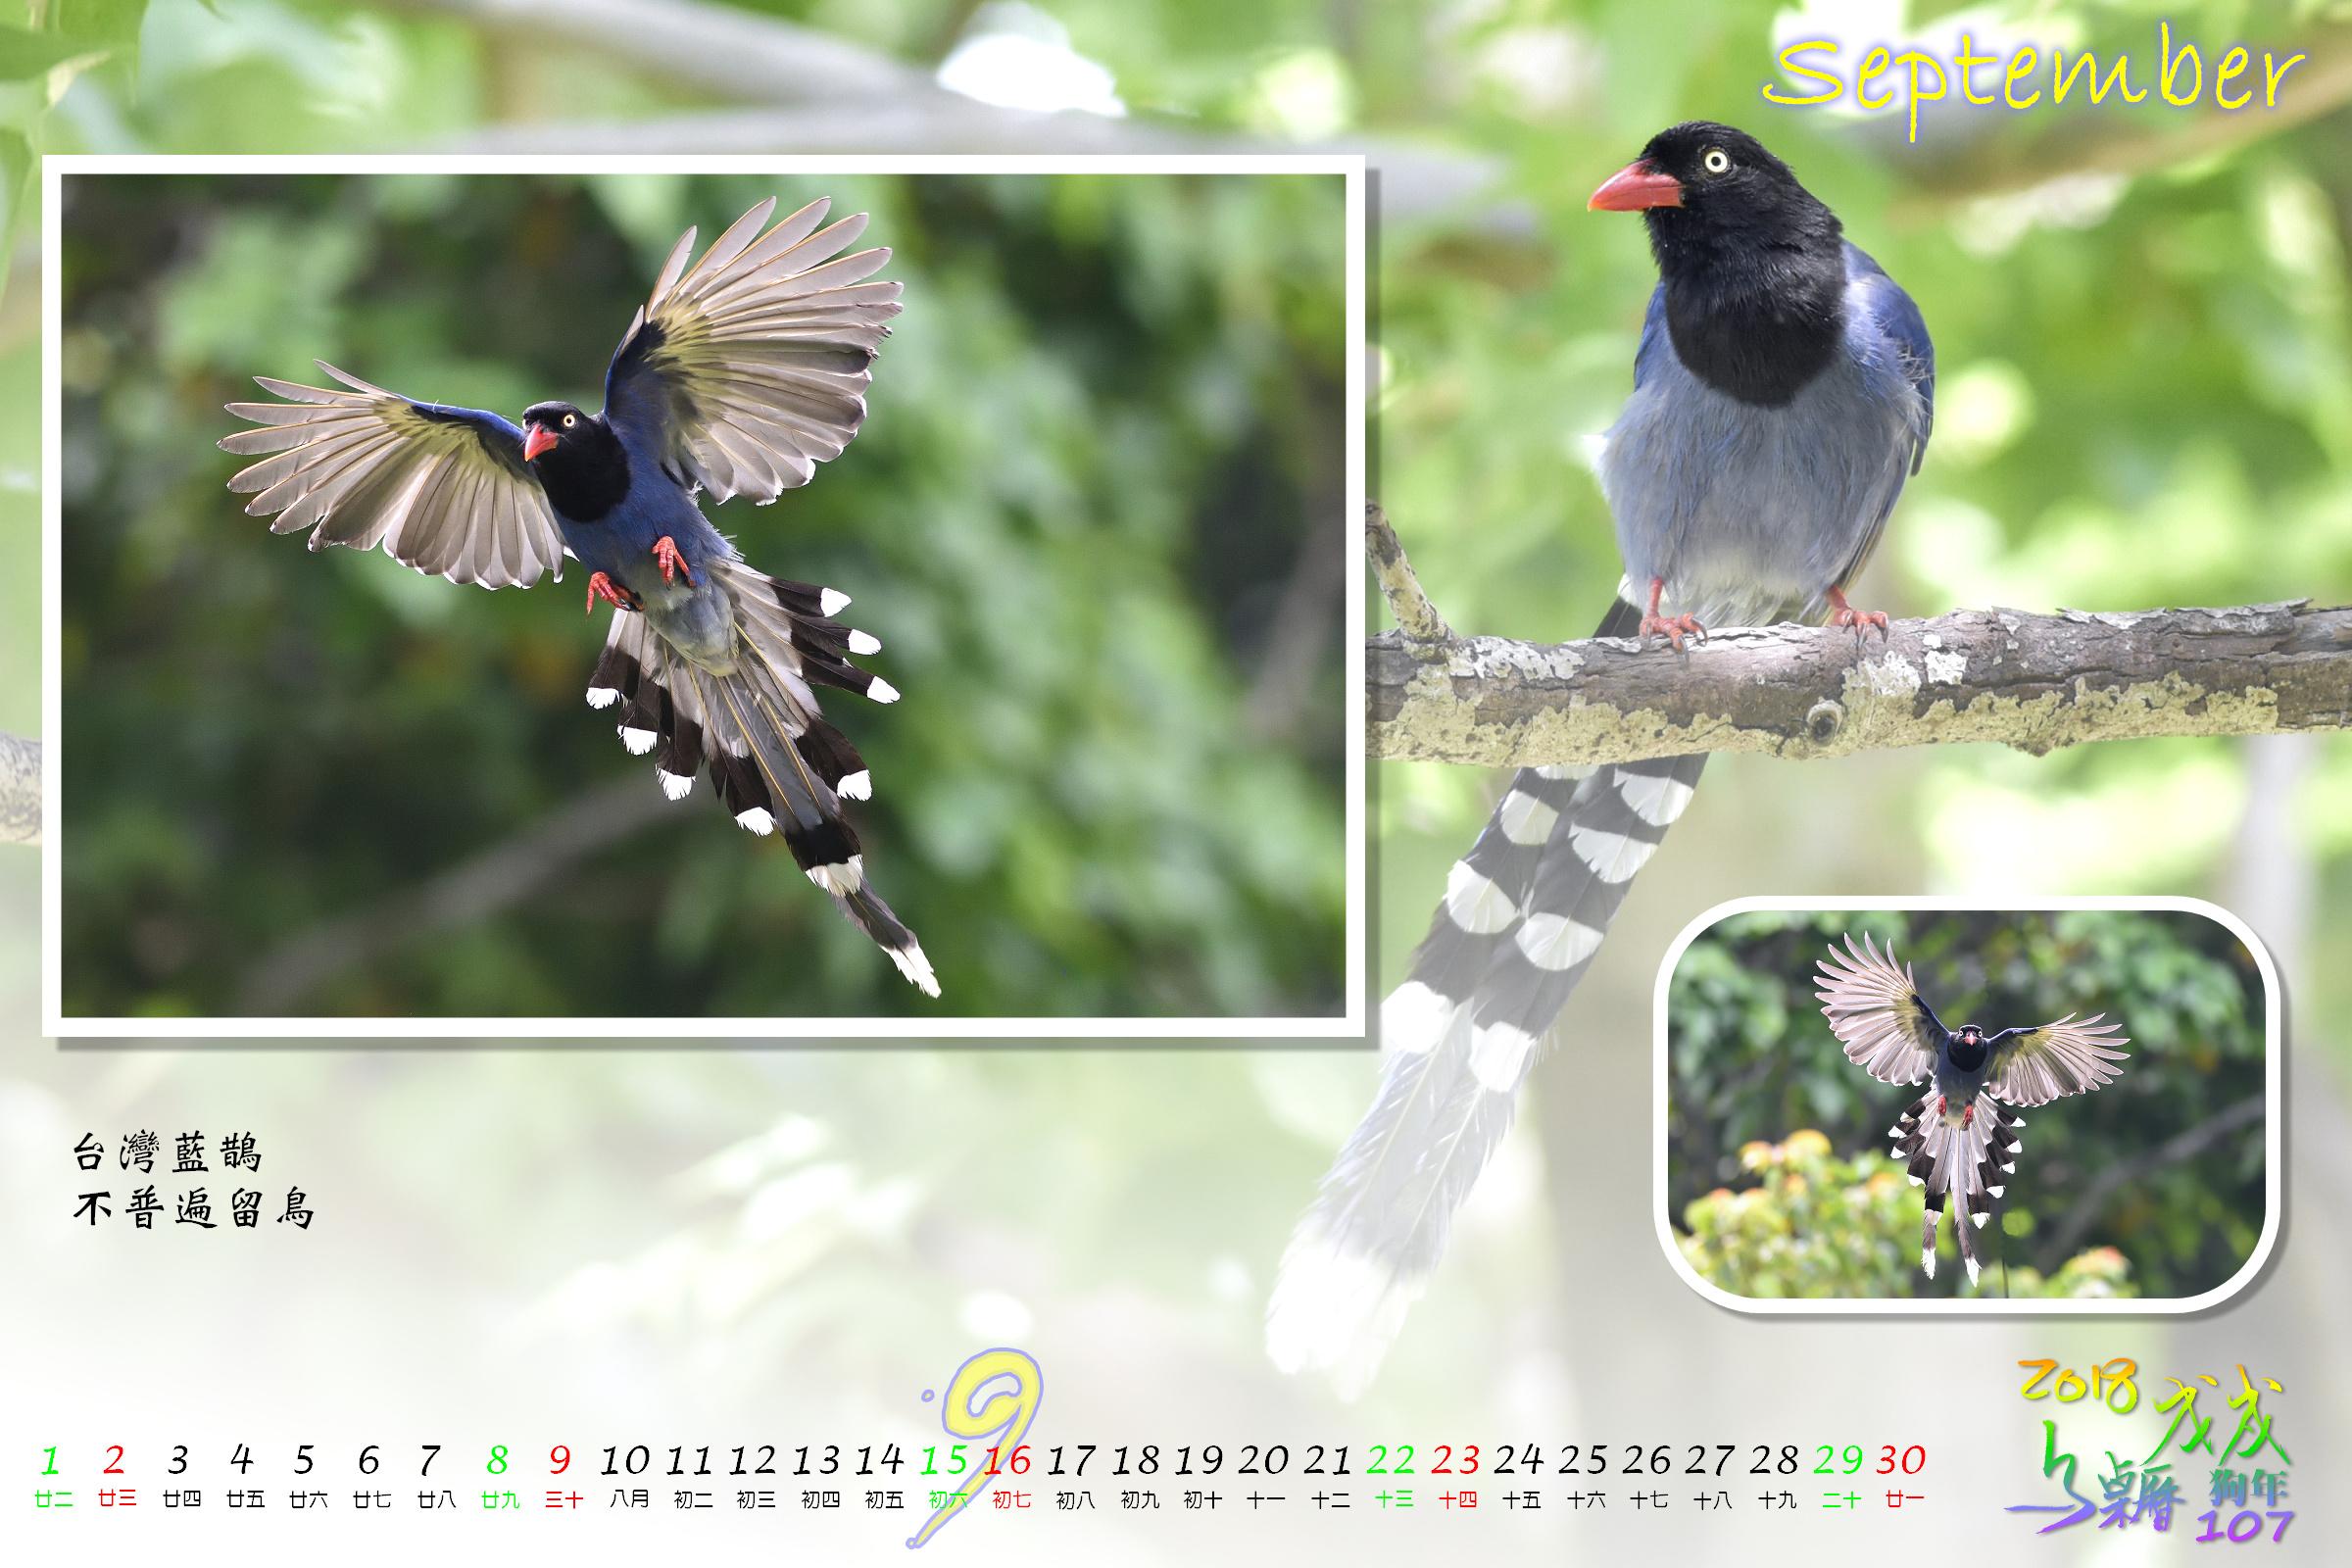 Calendar2018_Alder2_09